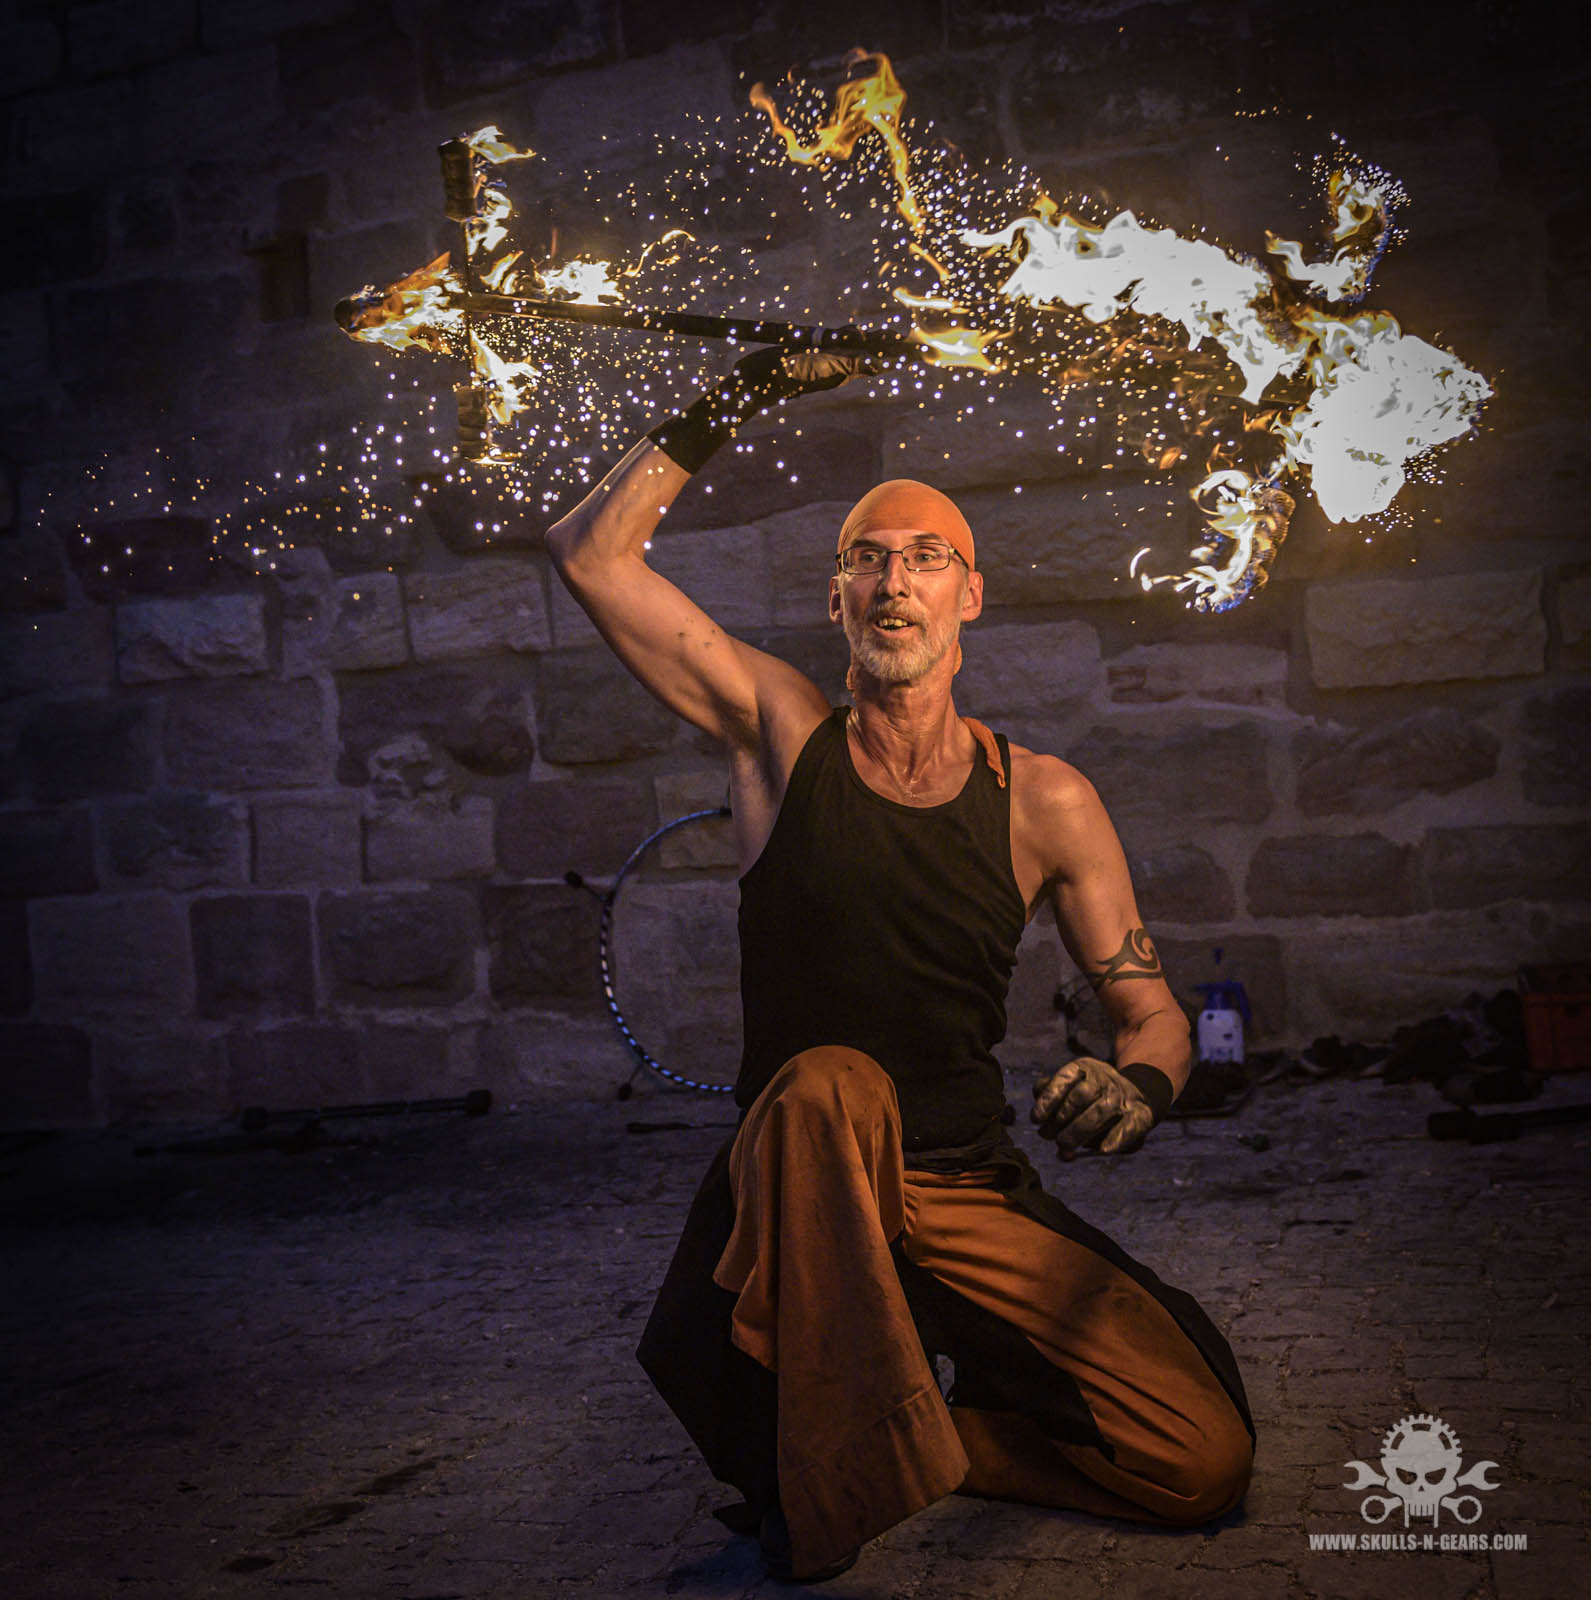 Feuertanz Festival 2019 - Feuershow-1236